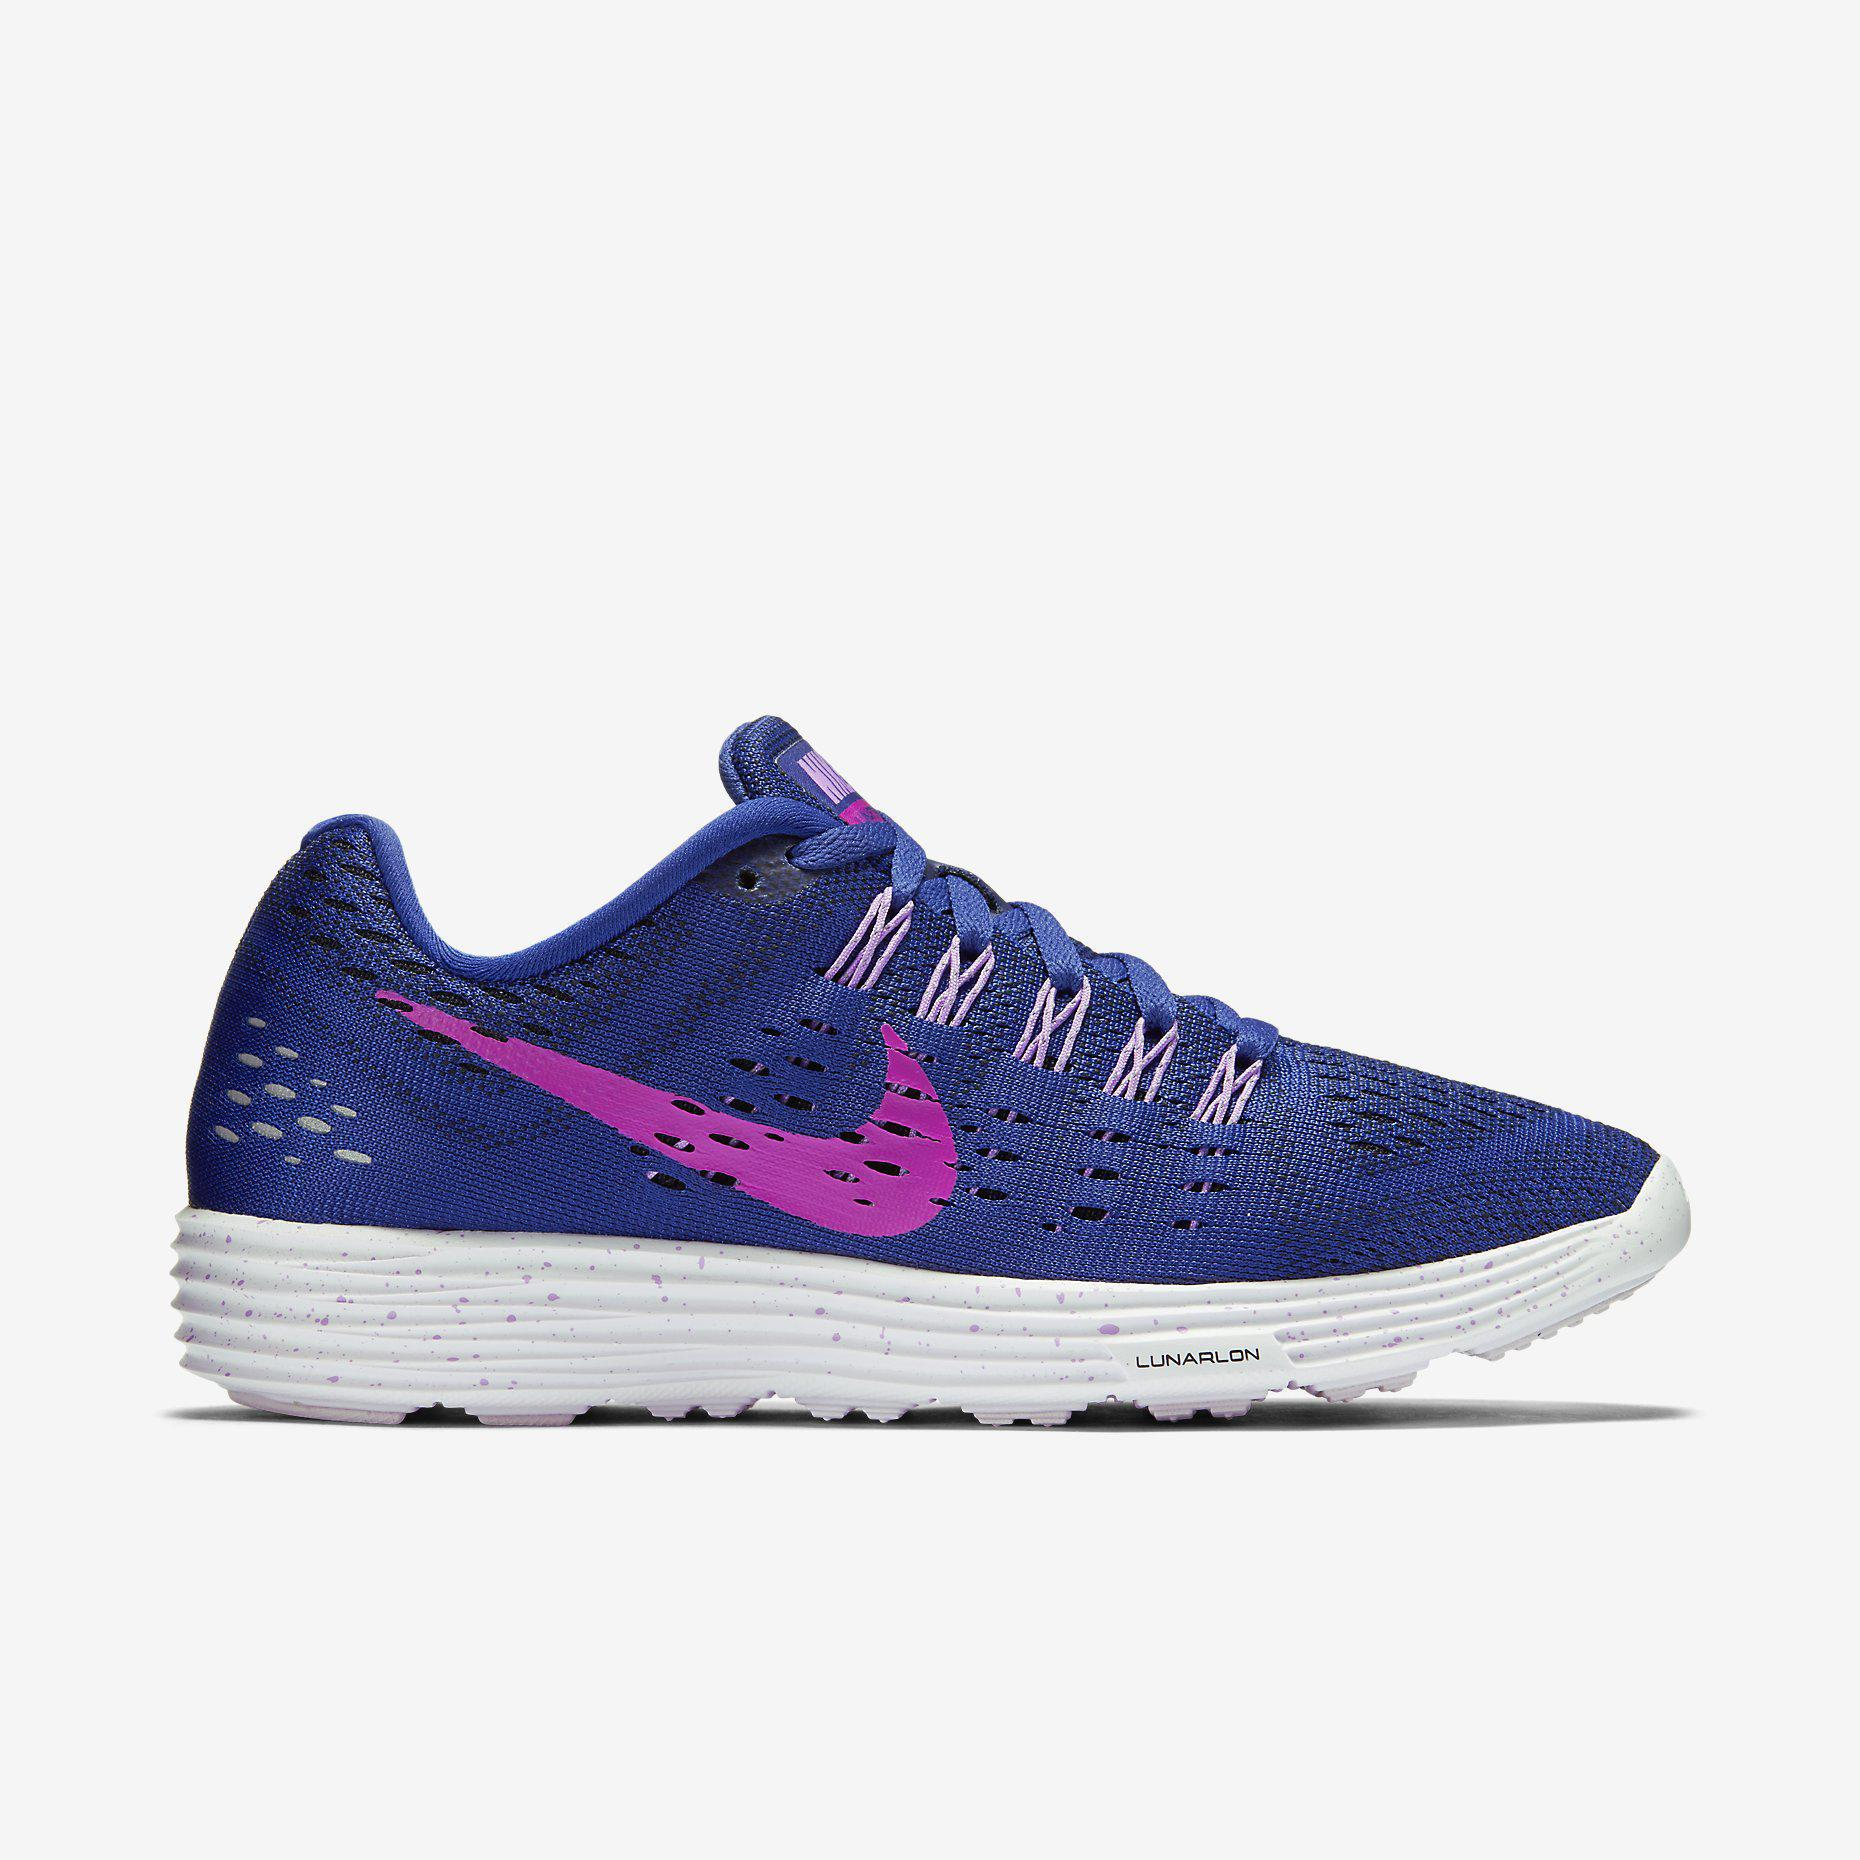 7e30857b1a9a Nike Womens LunarTempo Running Shoes - Deep Royal Blue Fuchsia -  Tennisnuts.com